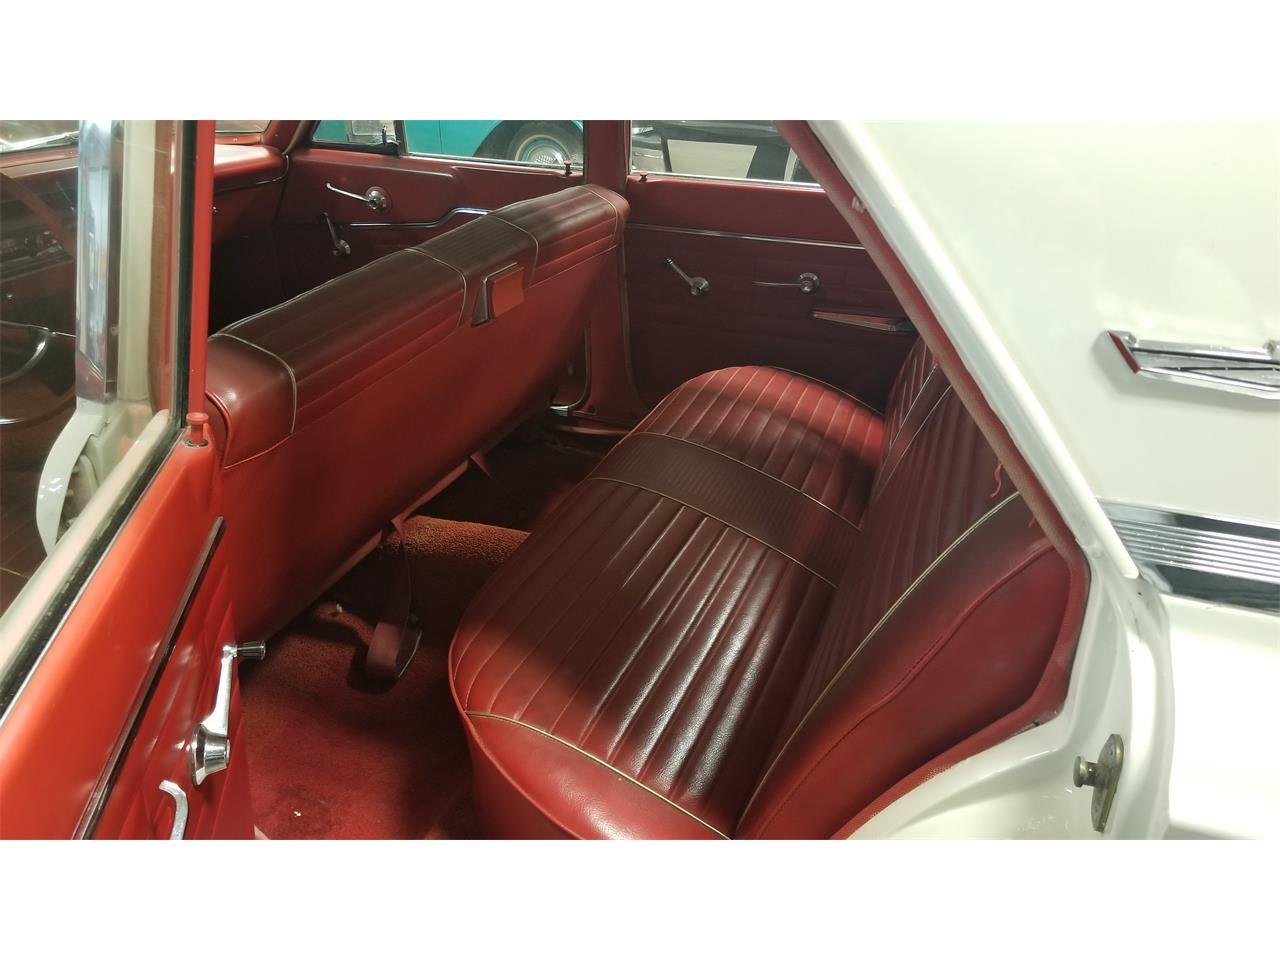 1964 Ford Fairlane 500 (CC-1323325) for sale in Council Bluffs, Iowa